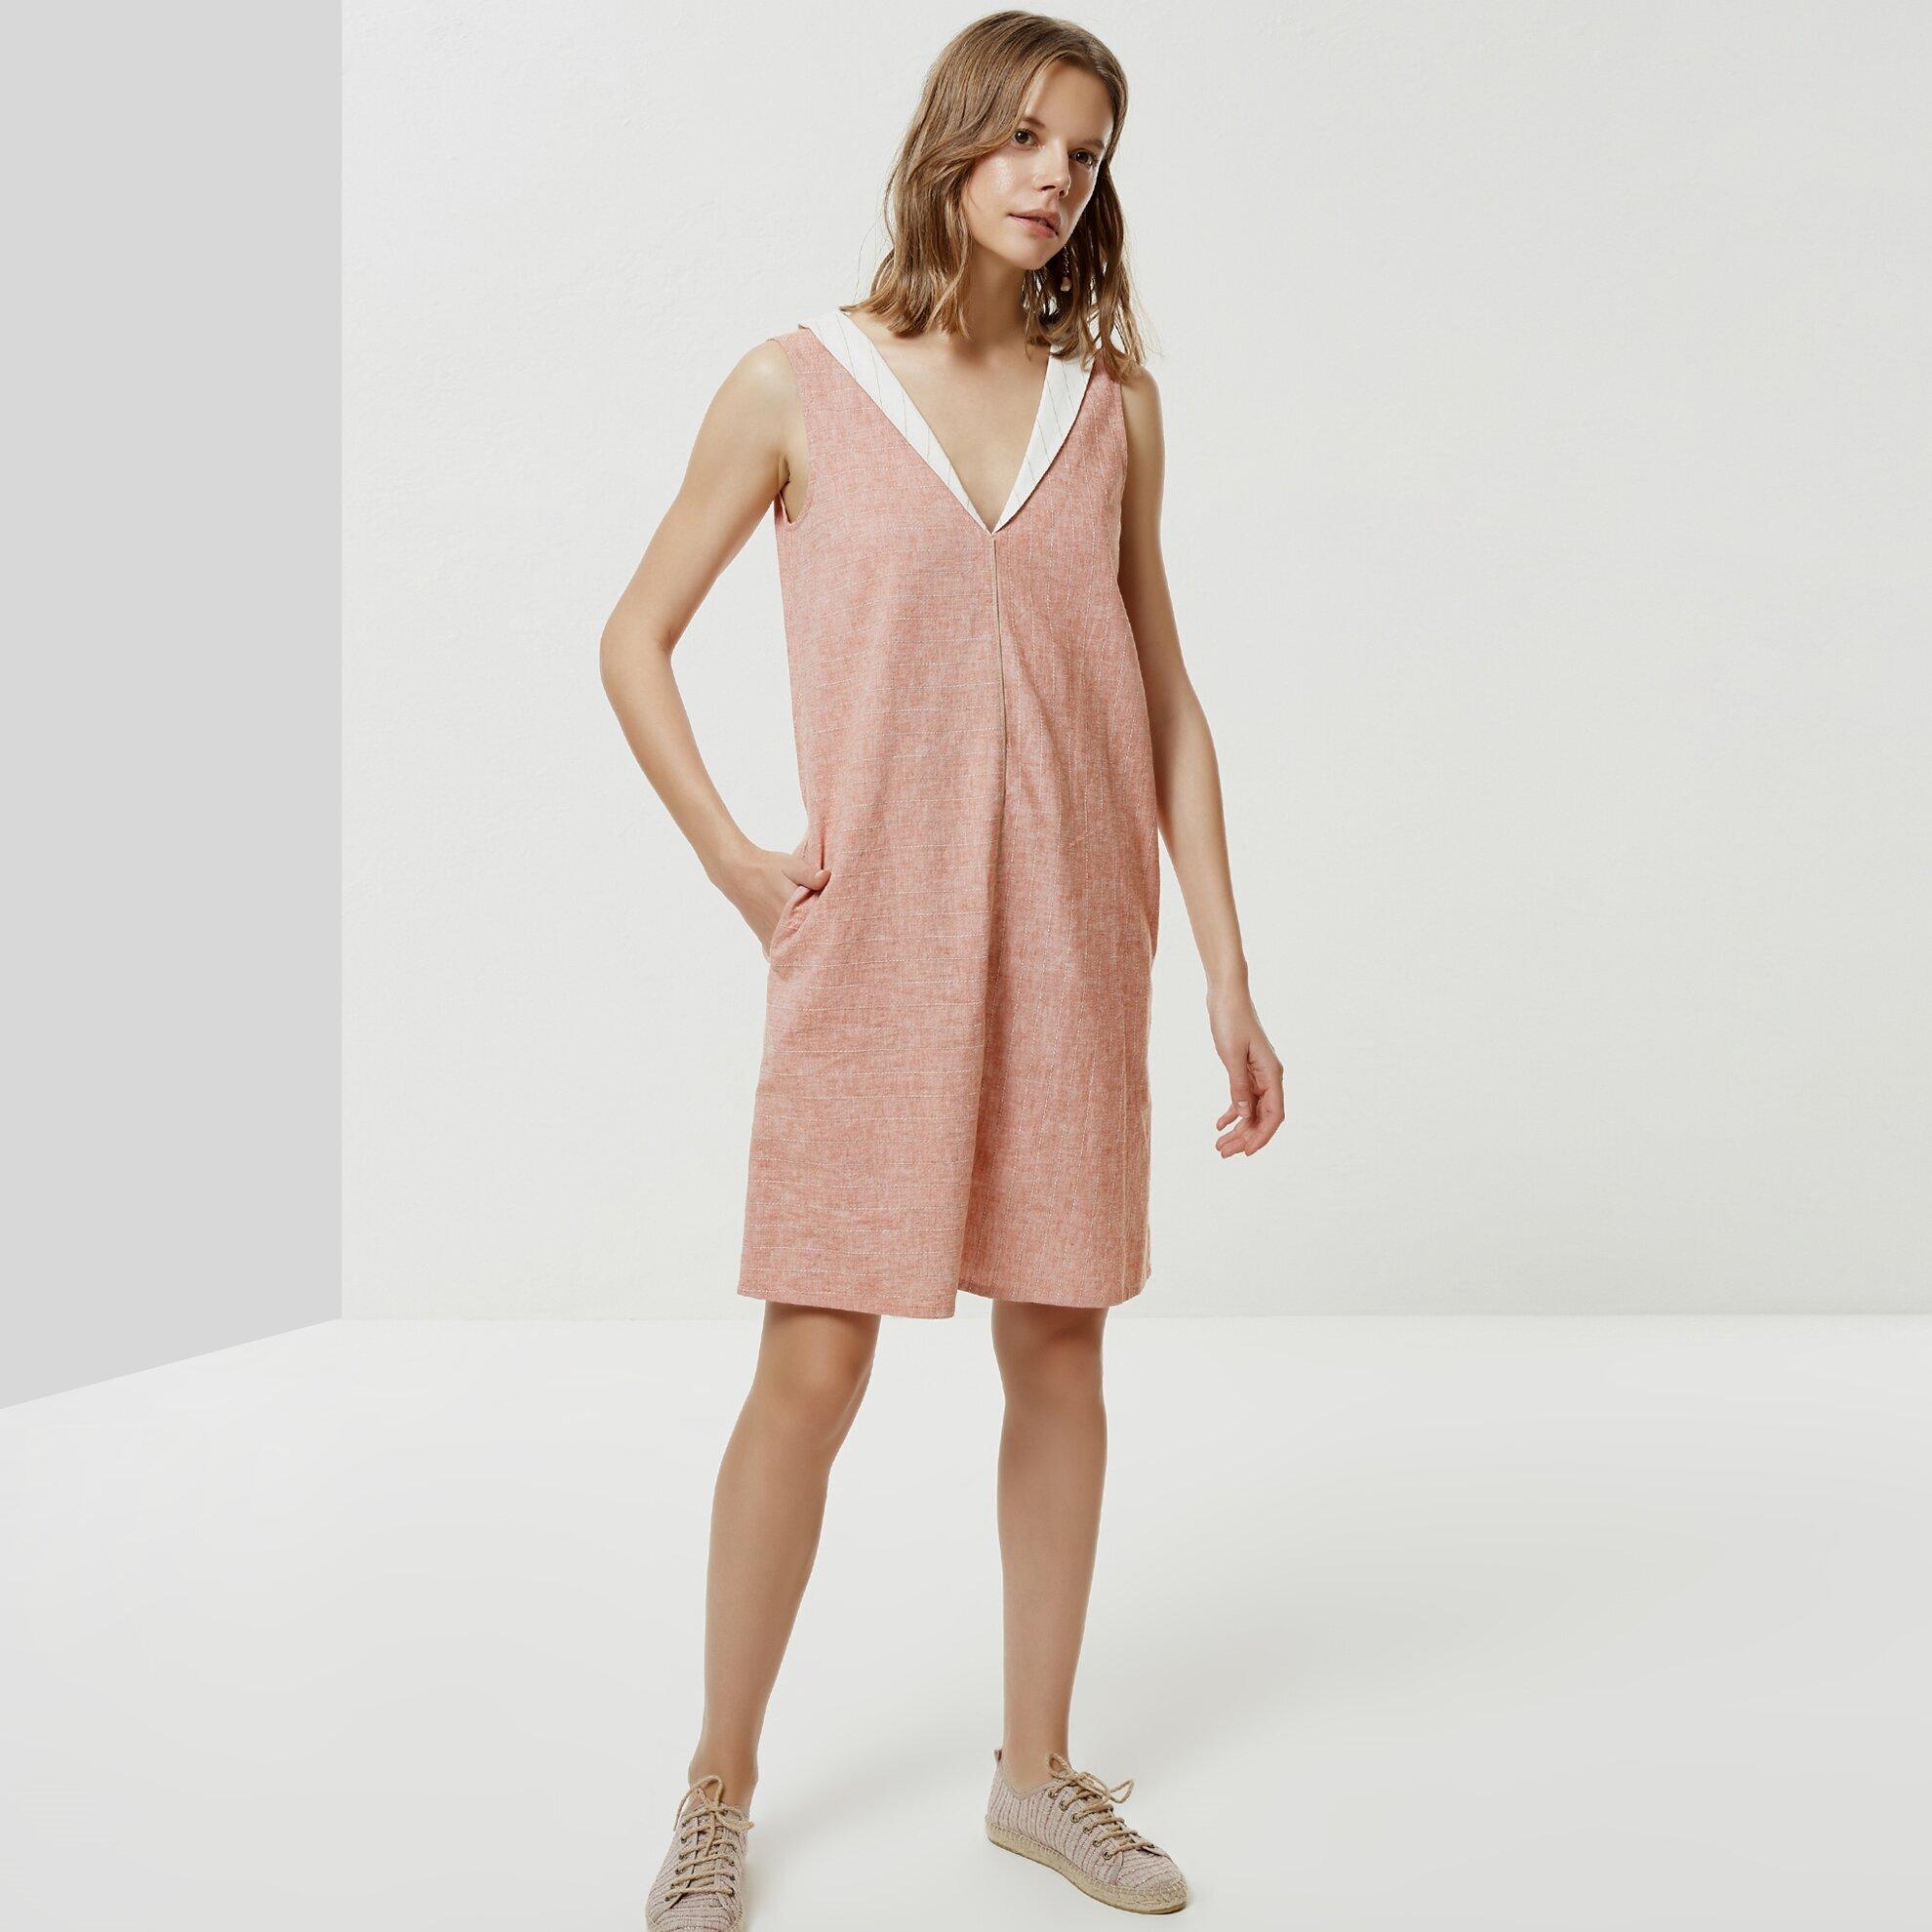 Şal Yaka Kolsuz Elbise